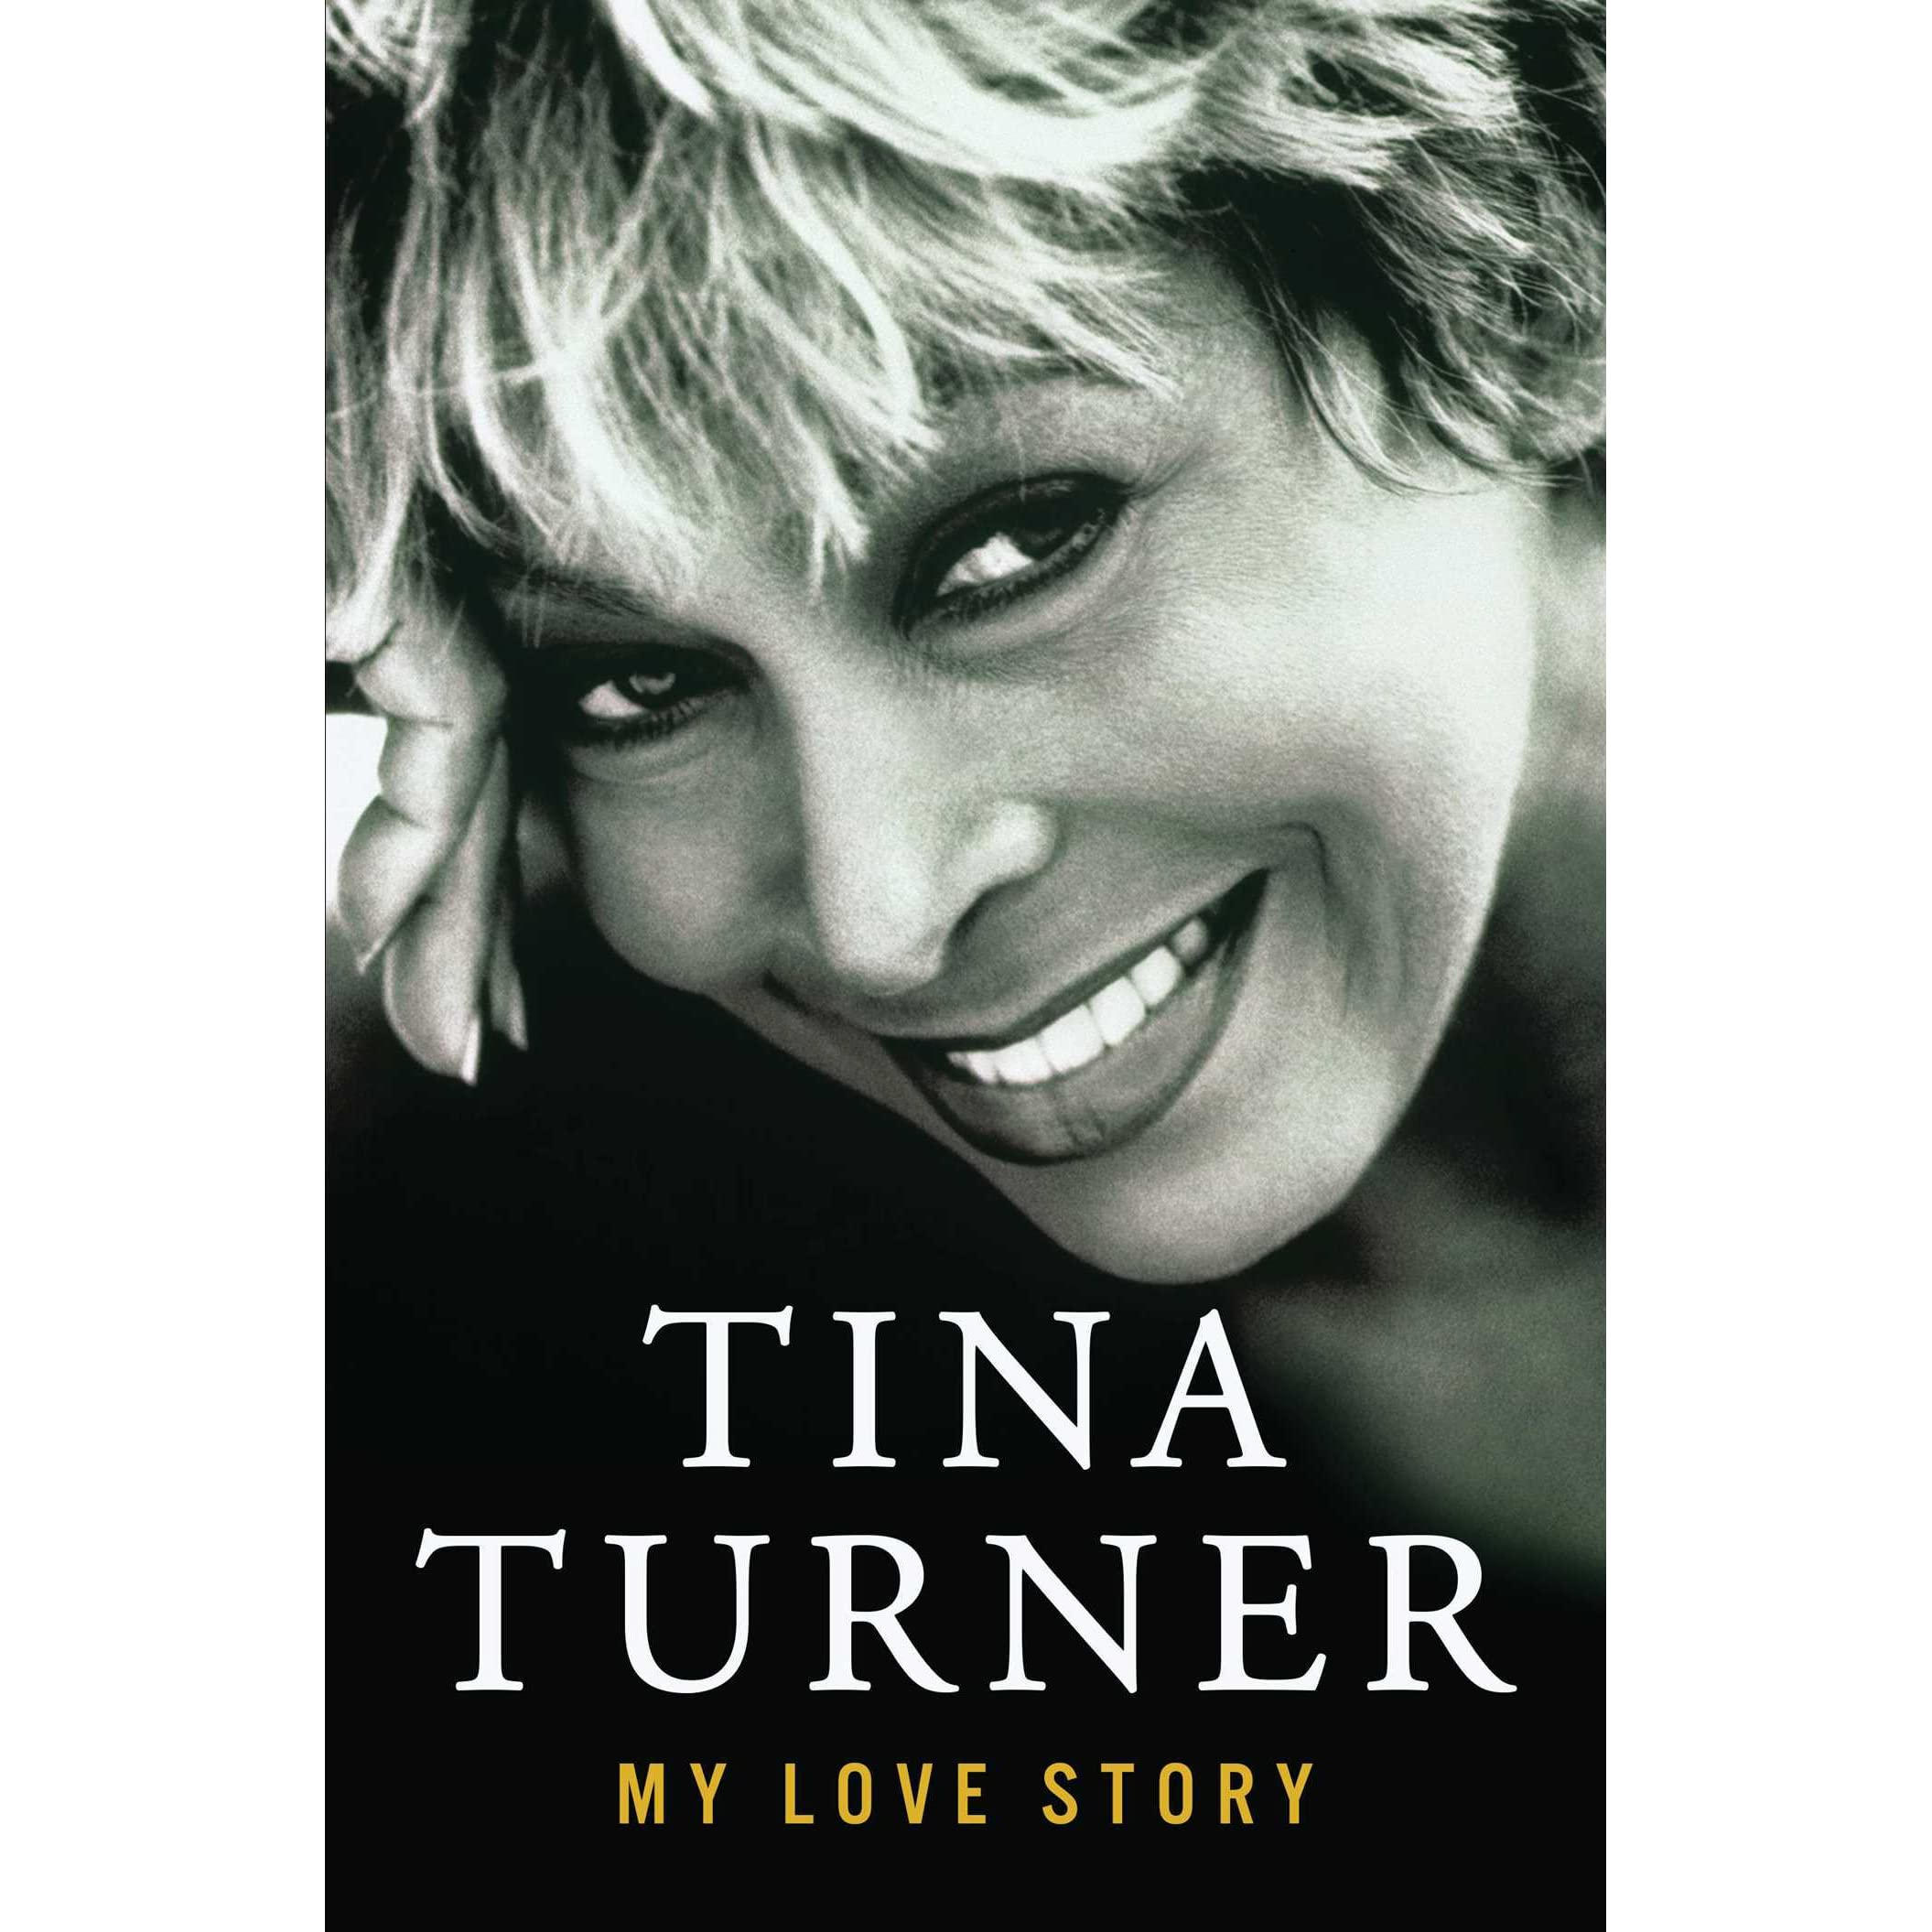 f92a9f85de My Love Story by Tina Turner